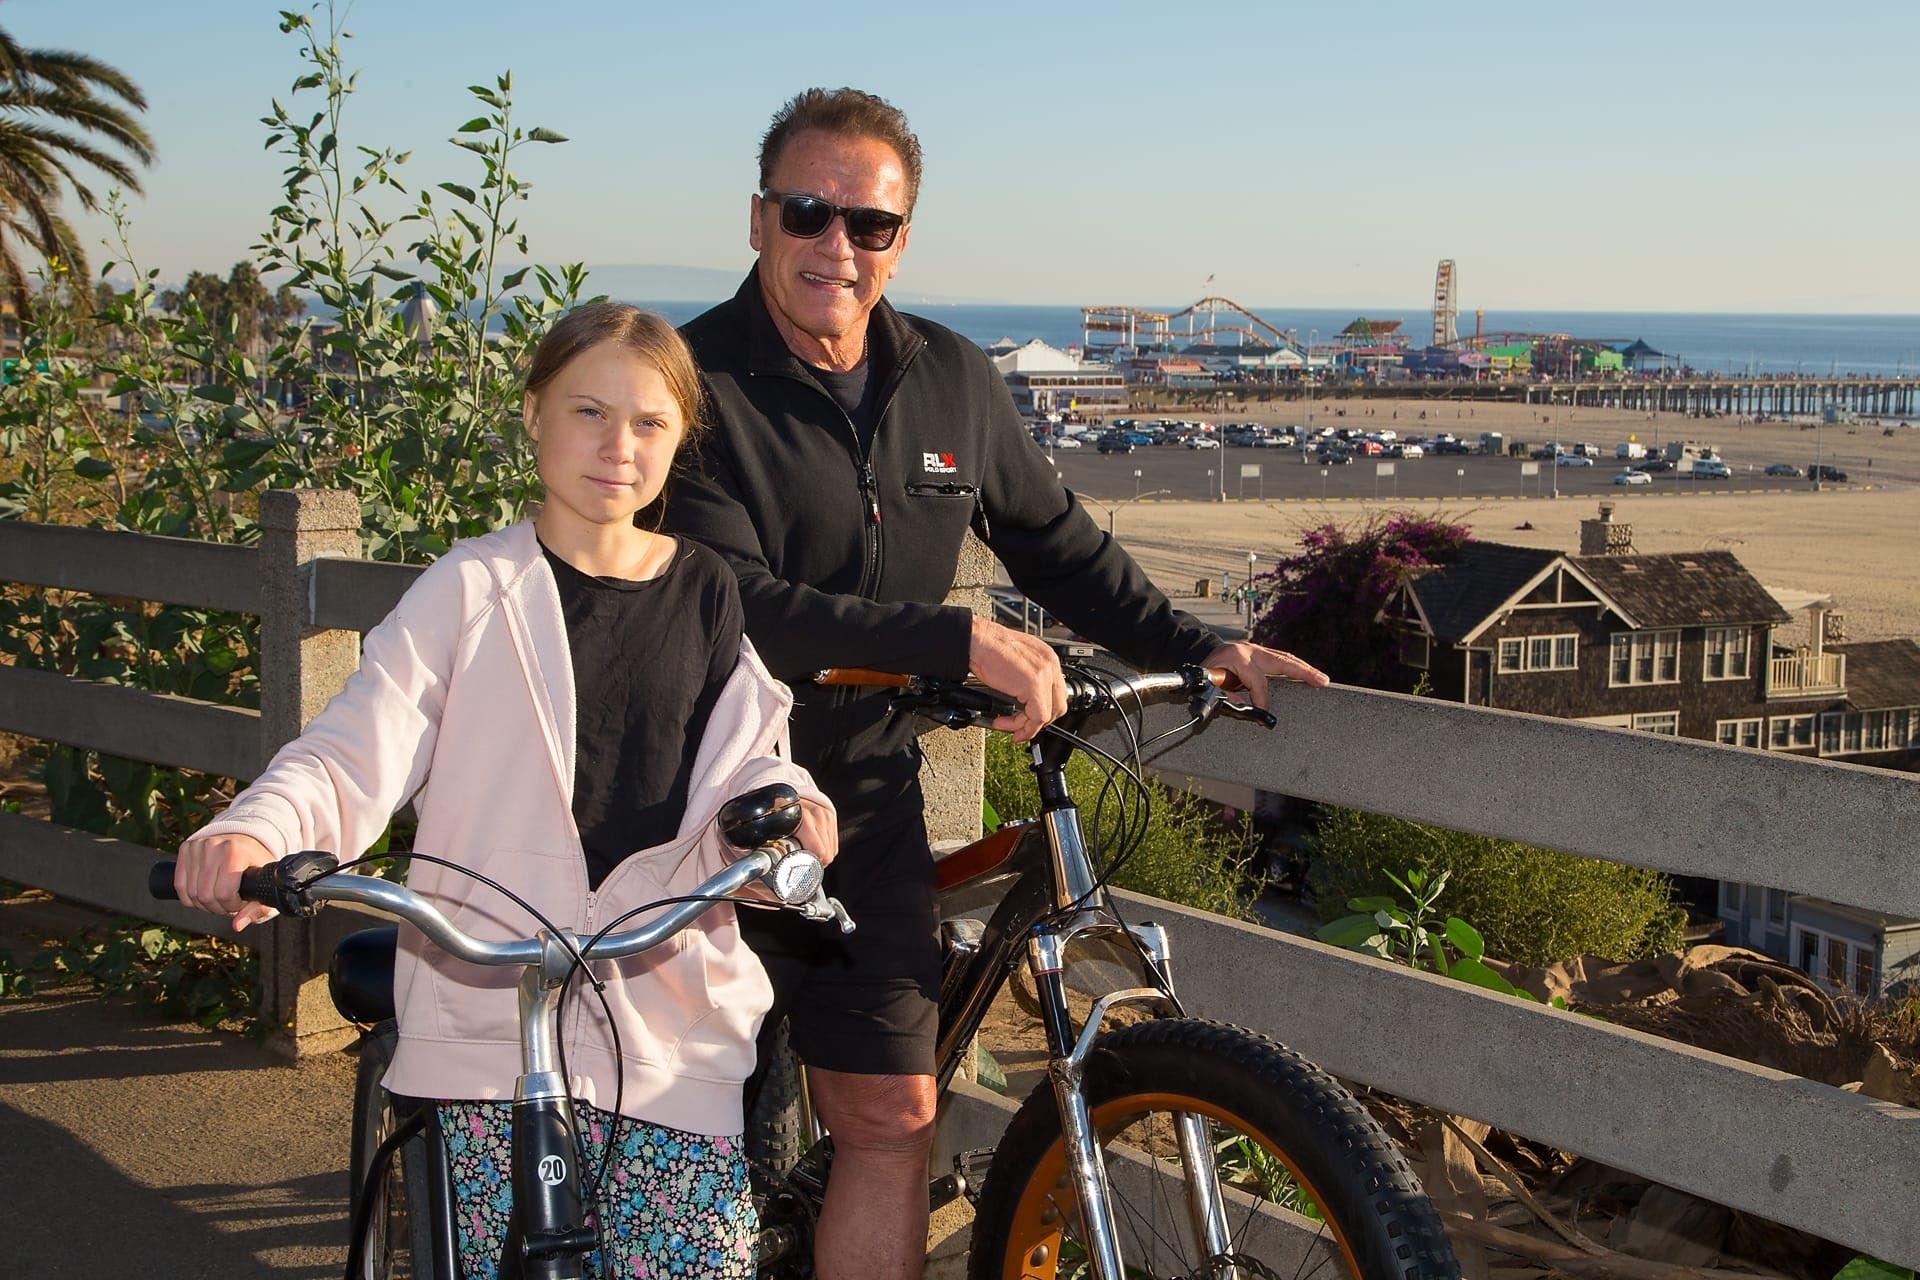 Amid 'ok-boomergate', Thunberg and Schwarzenegger go for a ride